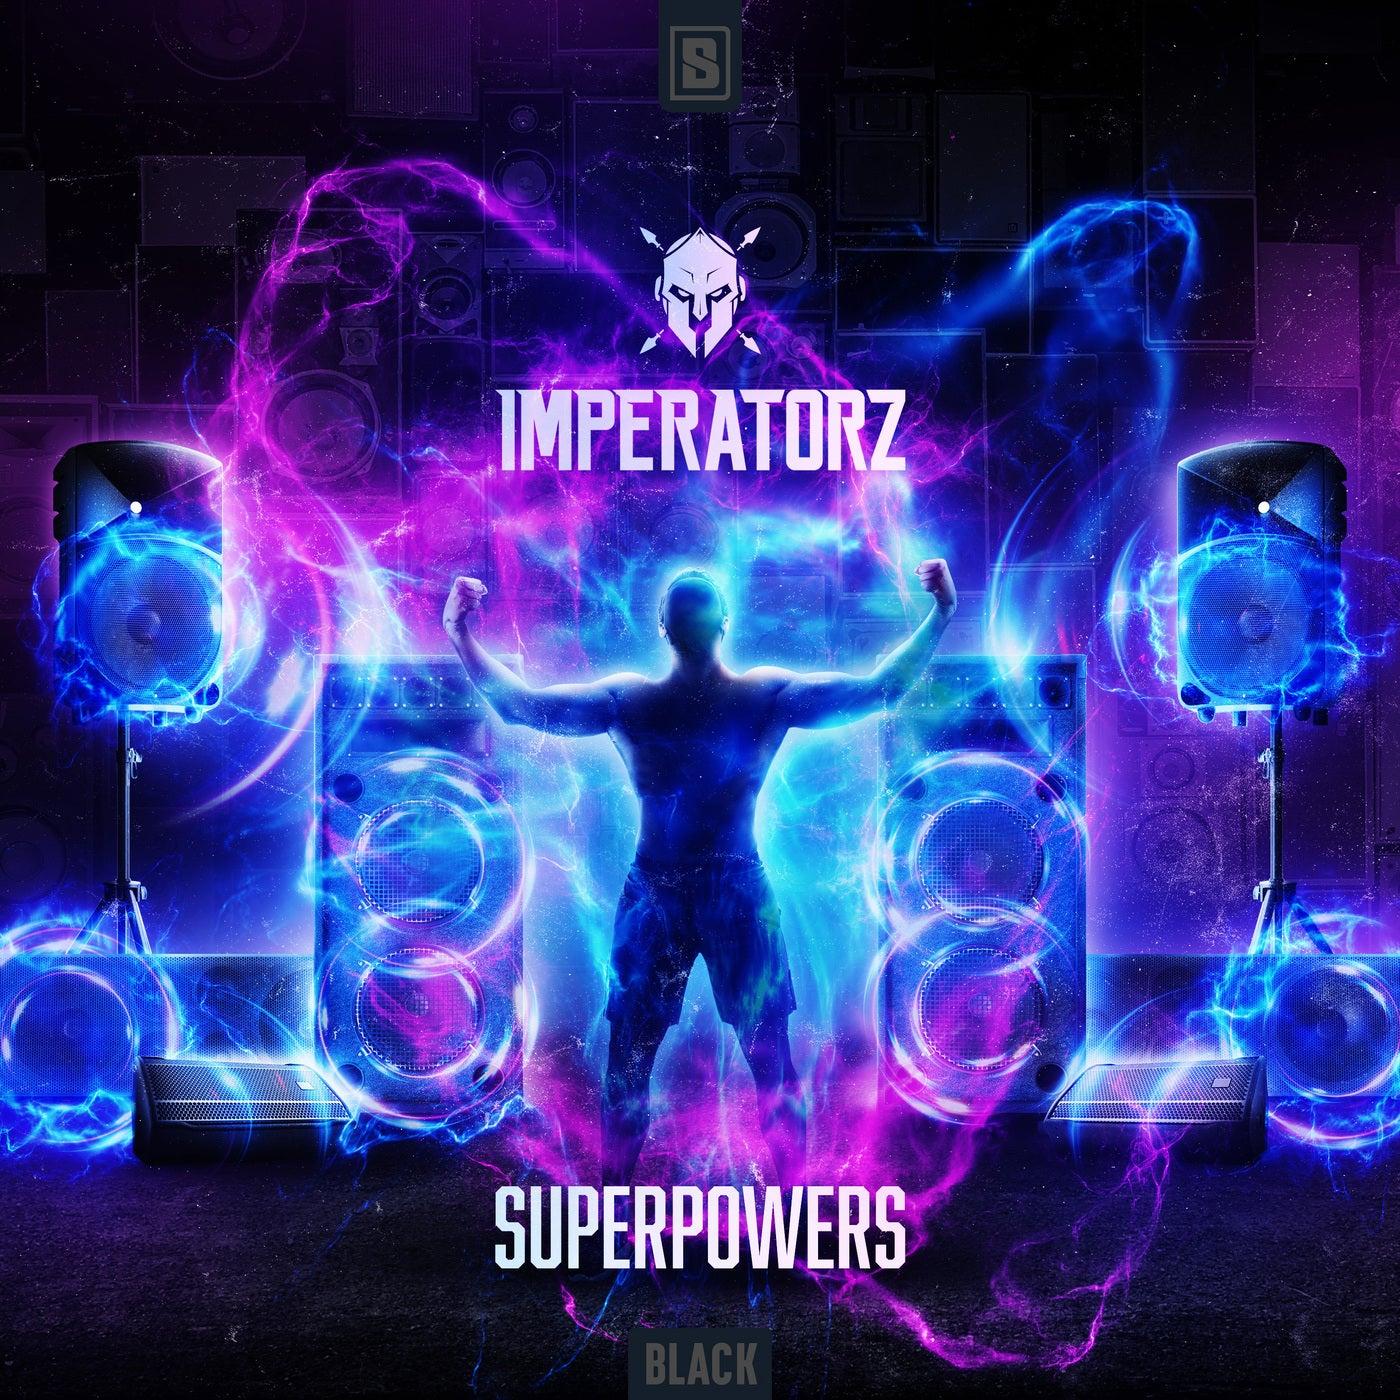 Superpowers (Original Mix)